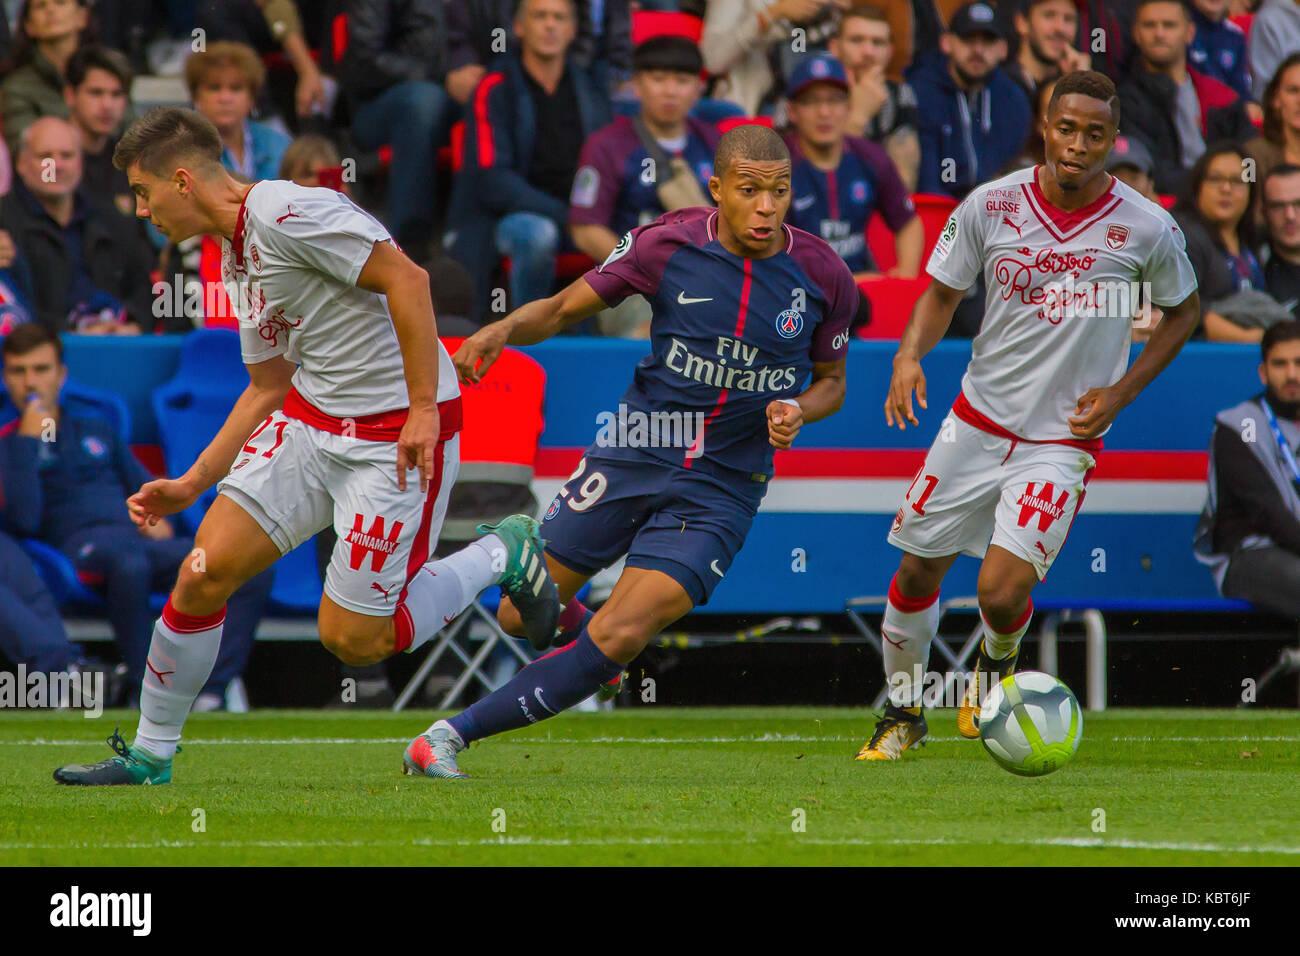 Kylian Mbappe in action during the French Ligue 1 soccer match between Paris Saint Germain (PSG) and Bordeaux at Parc des Princes. The match was won 6-2 by Paris Saint Germain. Stock Photo